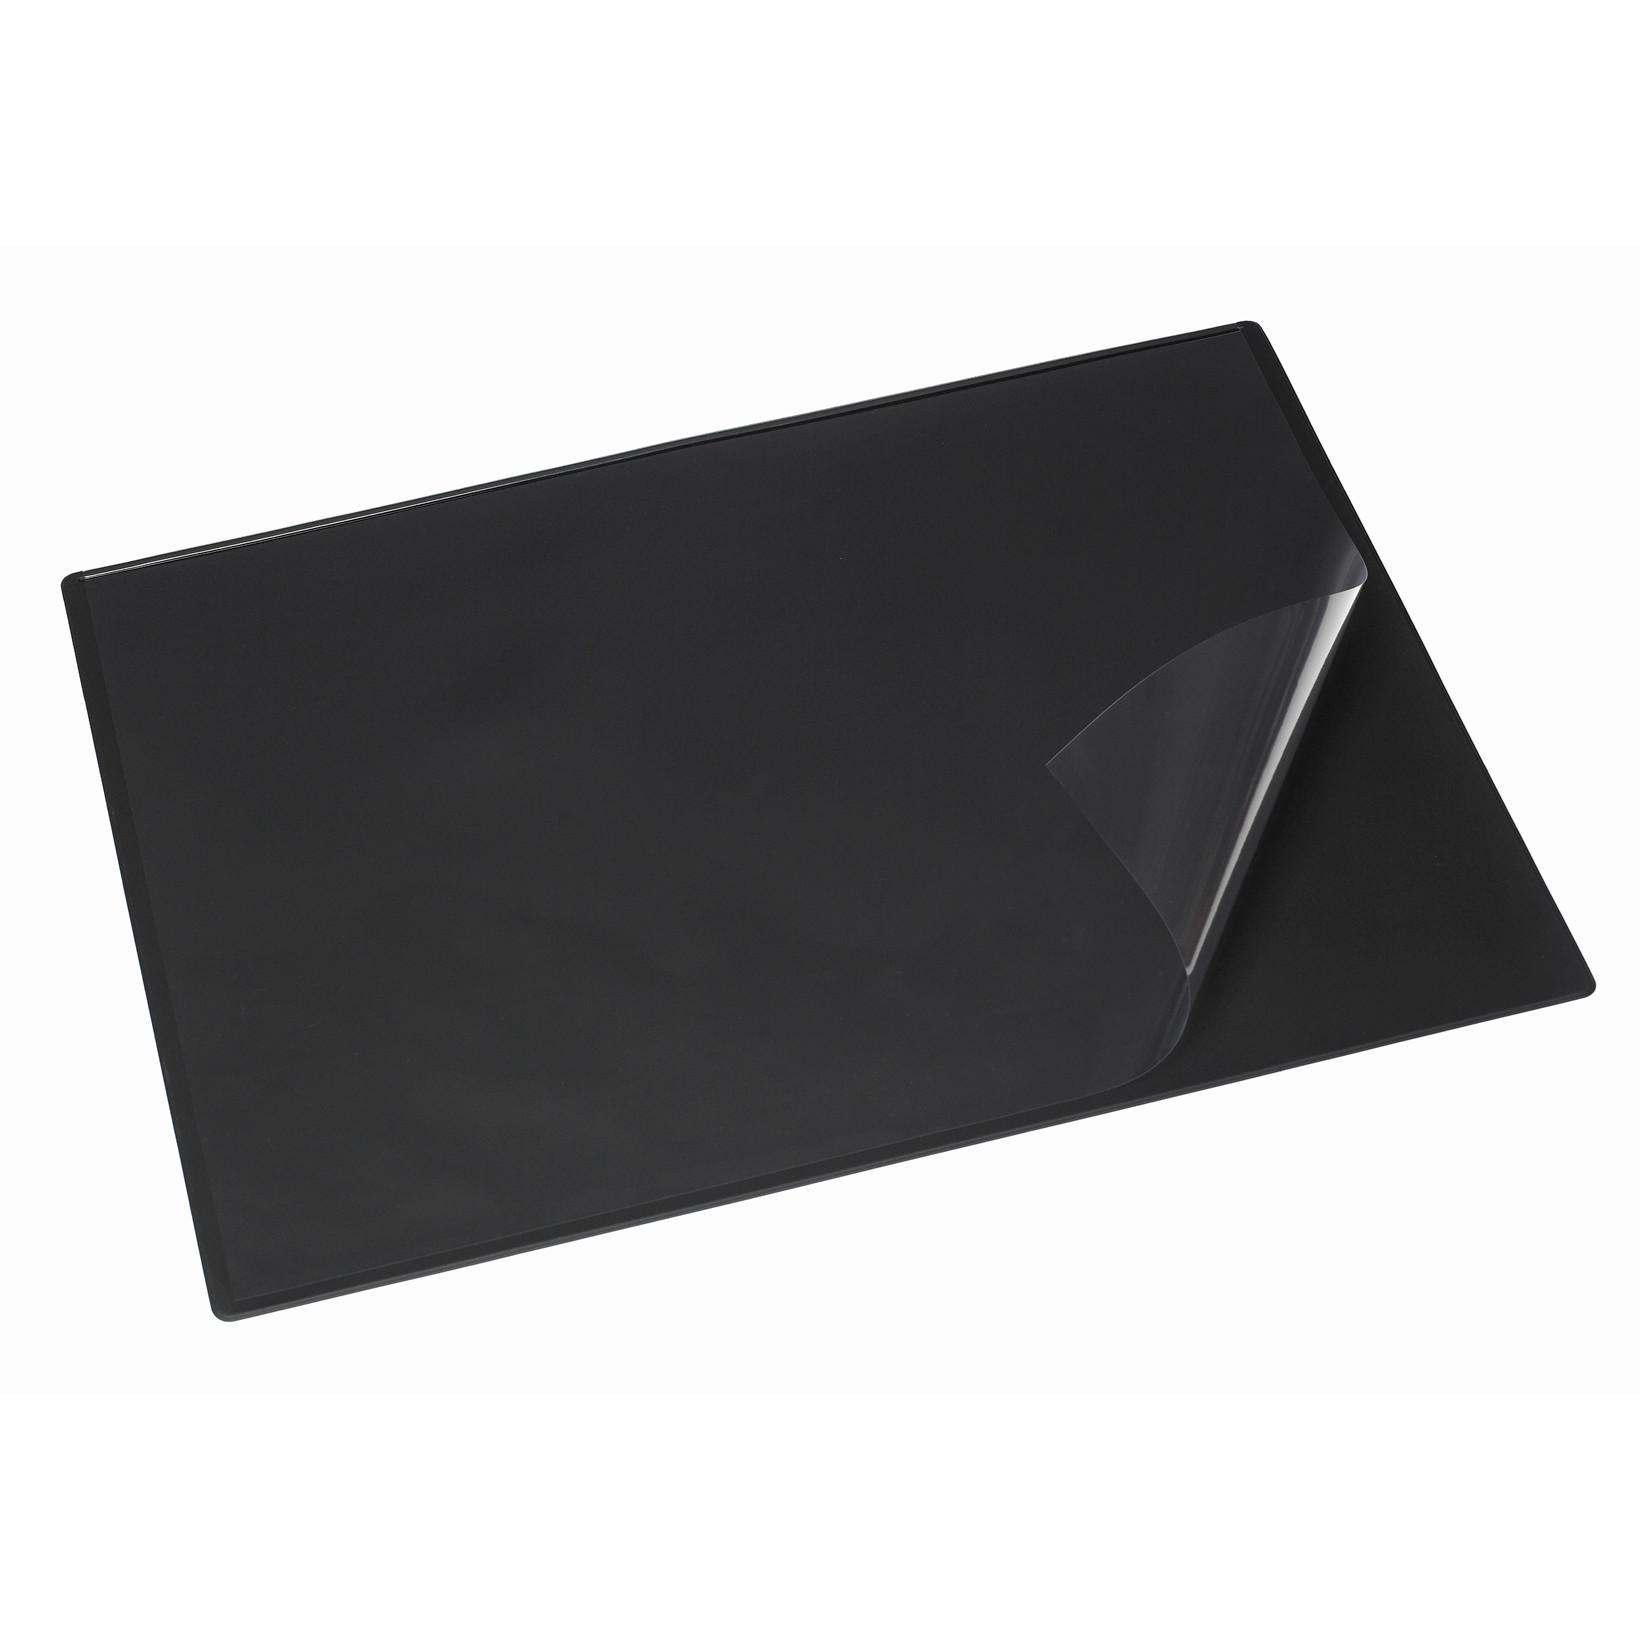 Bantex skriveunderlag sort - 49 x 65 cm